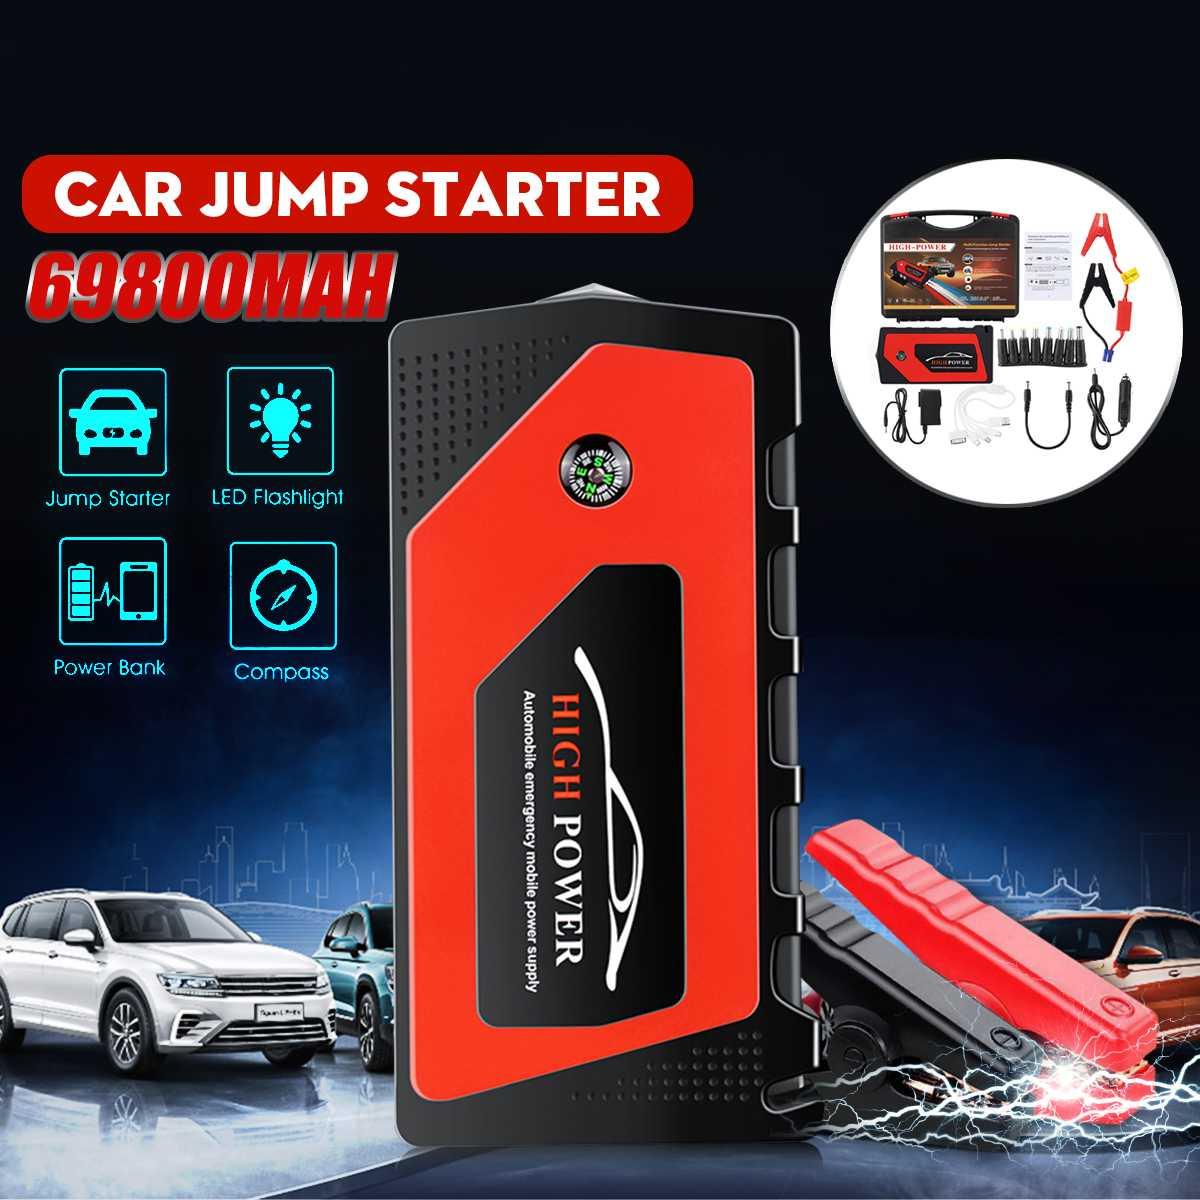 Portable Car Jump Starter 69800mAh 12V Car Jump Starter Booster Battery Charger USB Charger Emergency Power Bank Starting Device